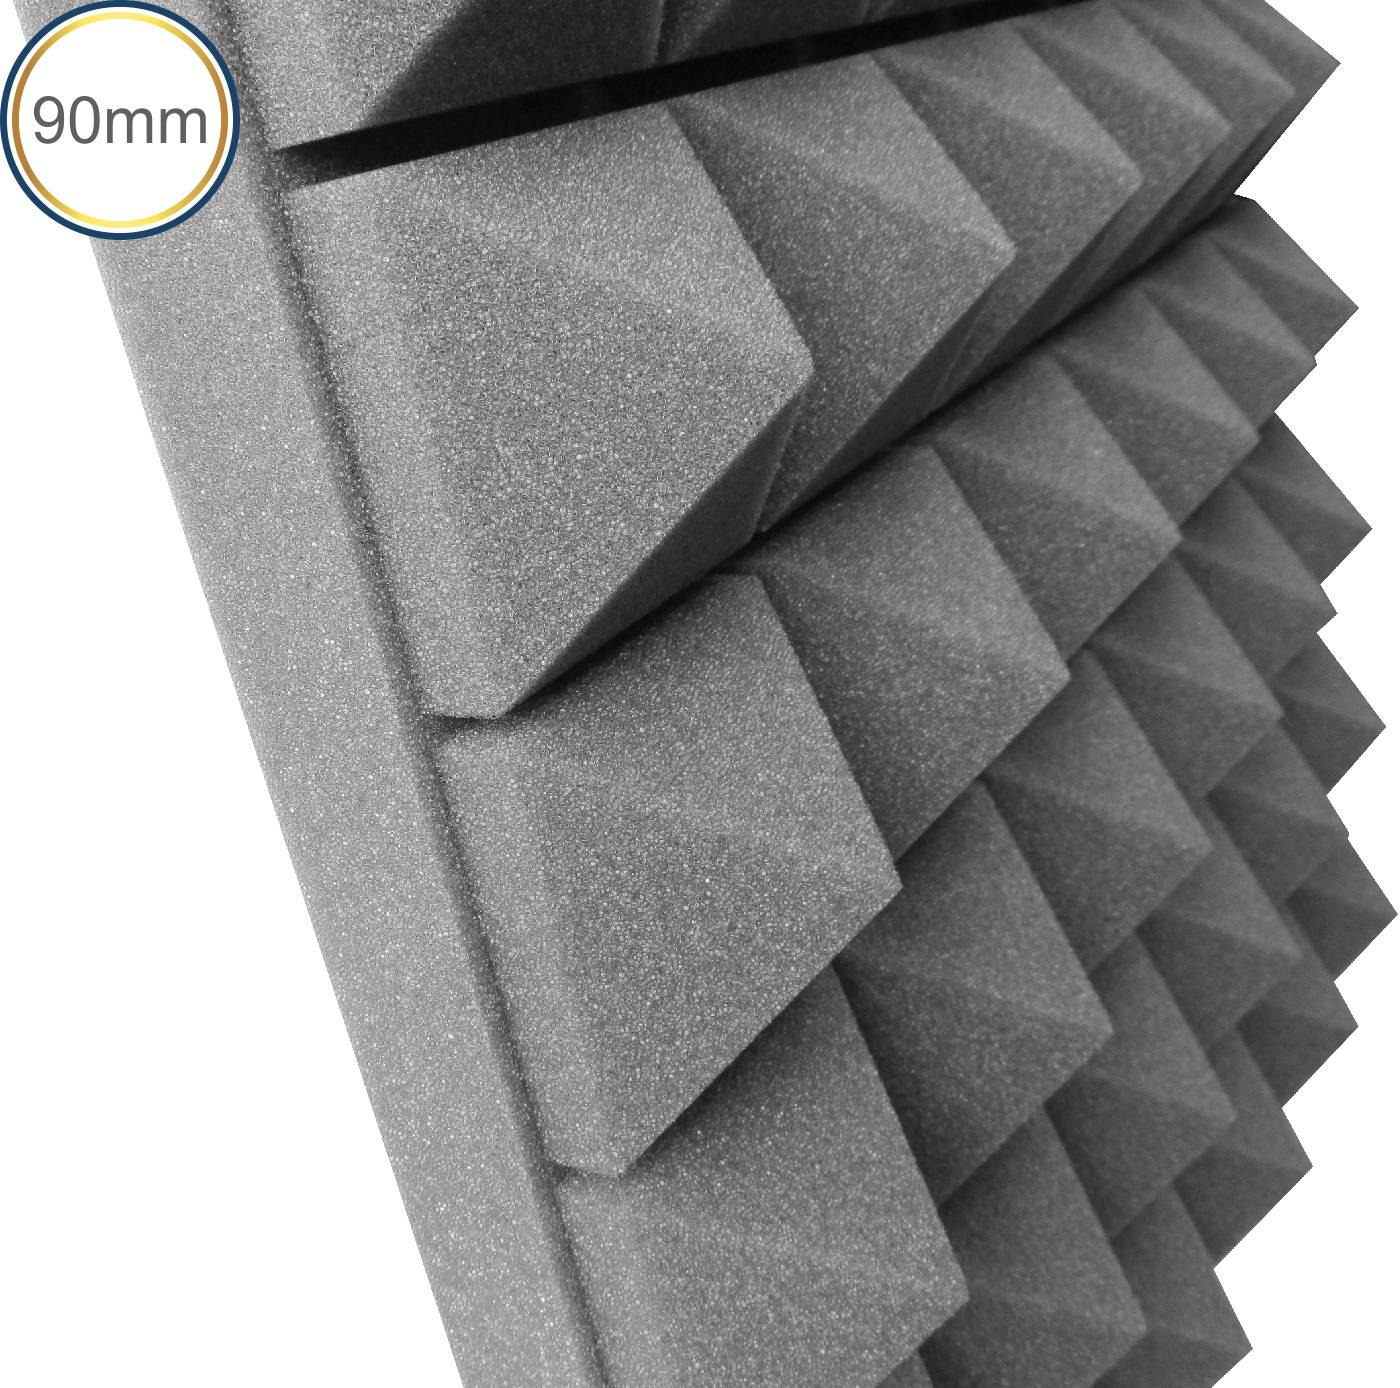 Espuma Acústica - Max T - Cinza - Kit 4 peças (1m²) 90mm  - Loja SPL Acústica